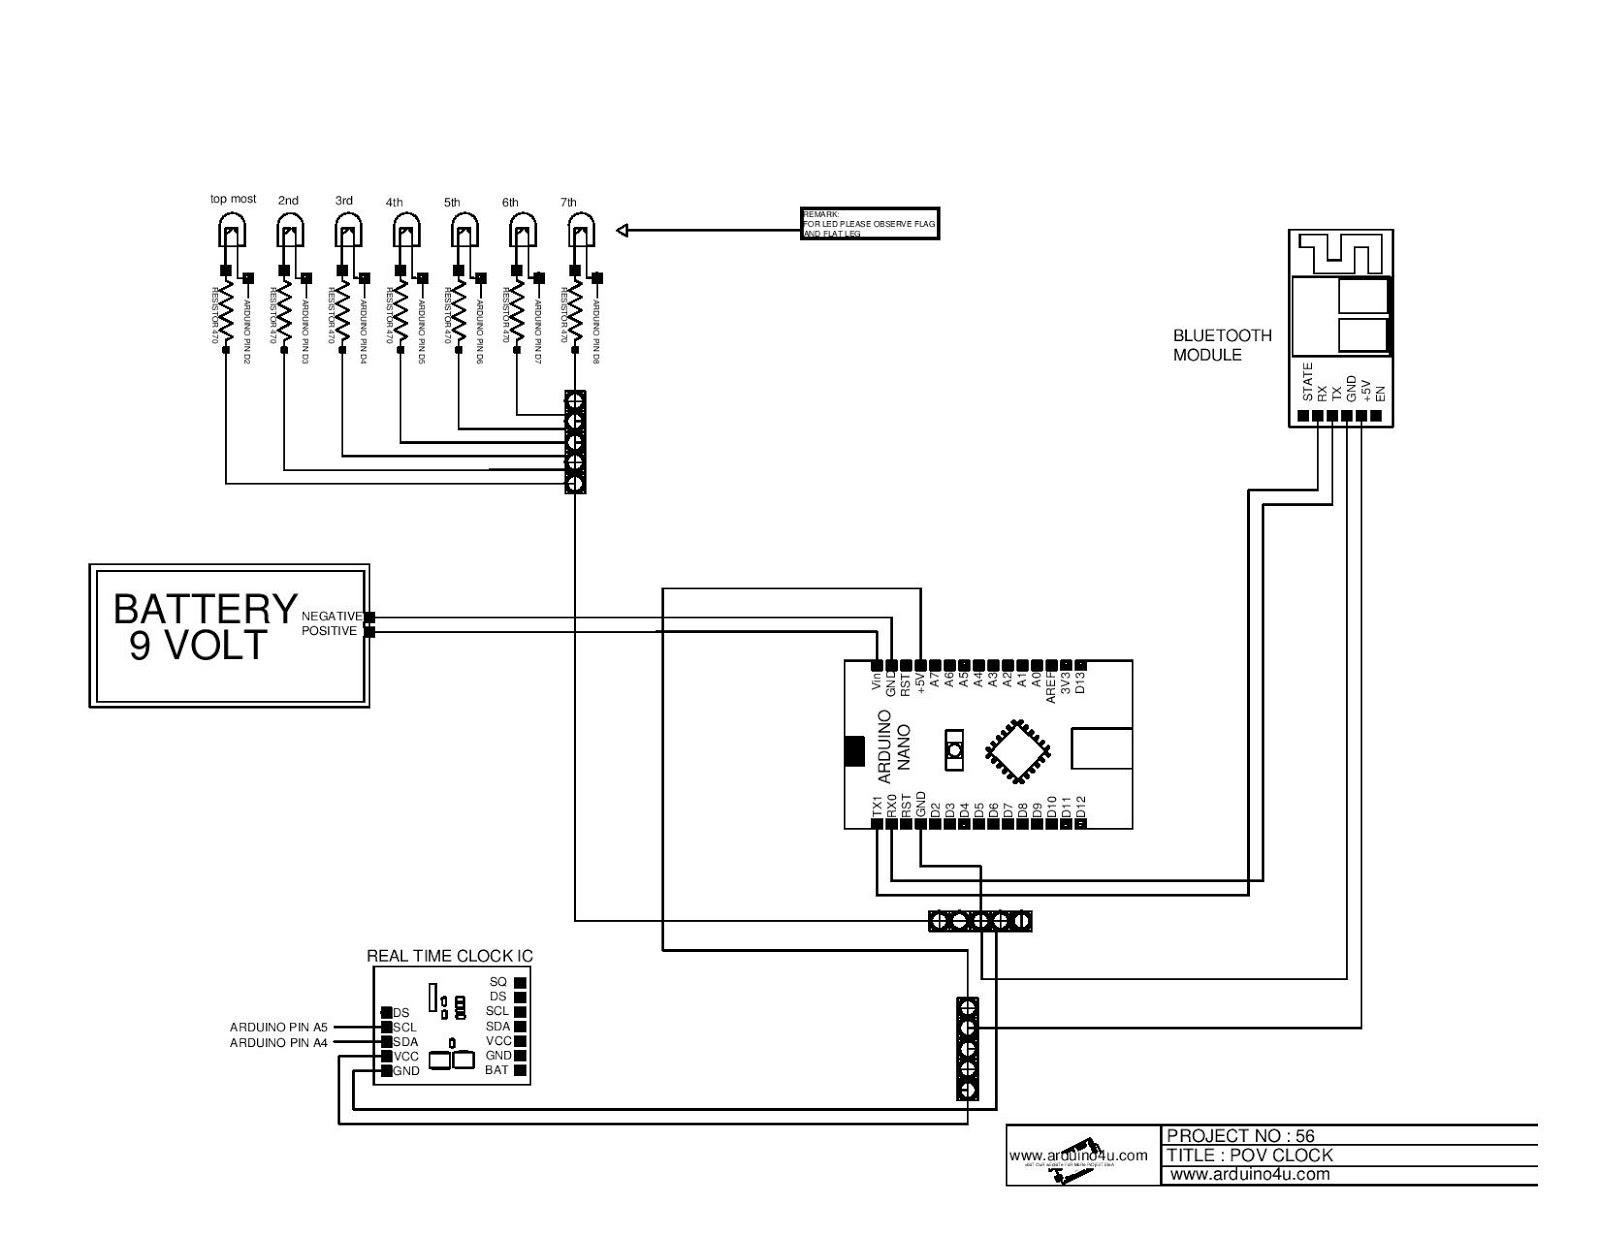 Projek Elektronik Arduino4u.com: 56.POV clock